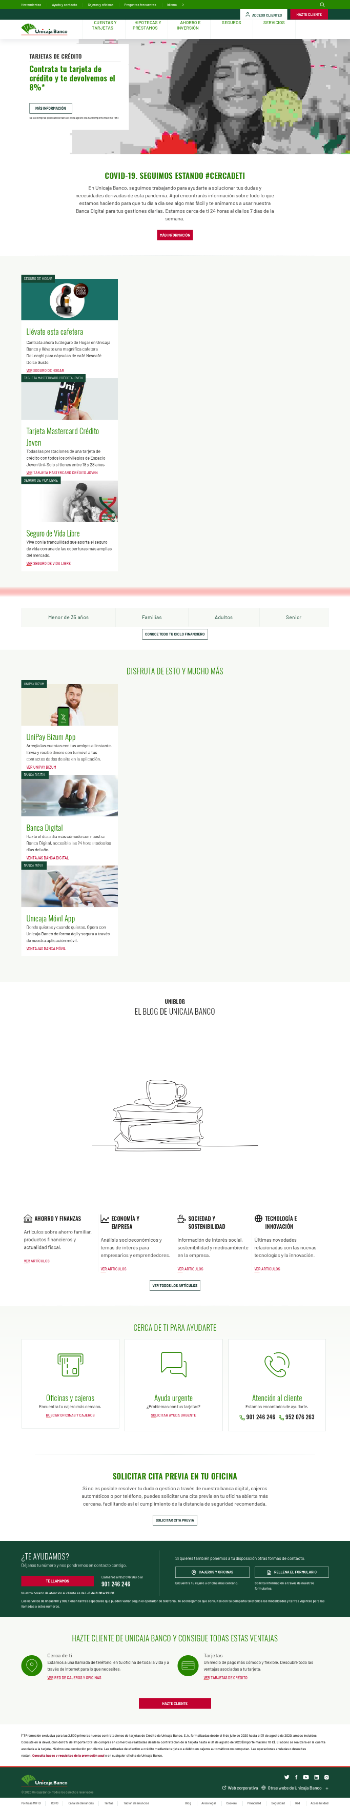 Unicaja Banco, S.A. Website Screenshot